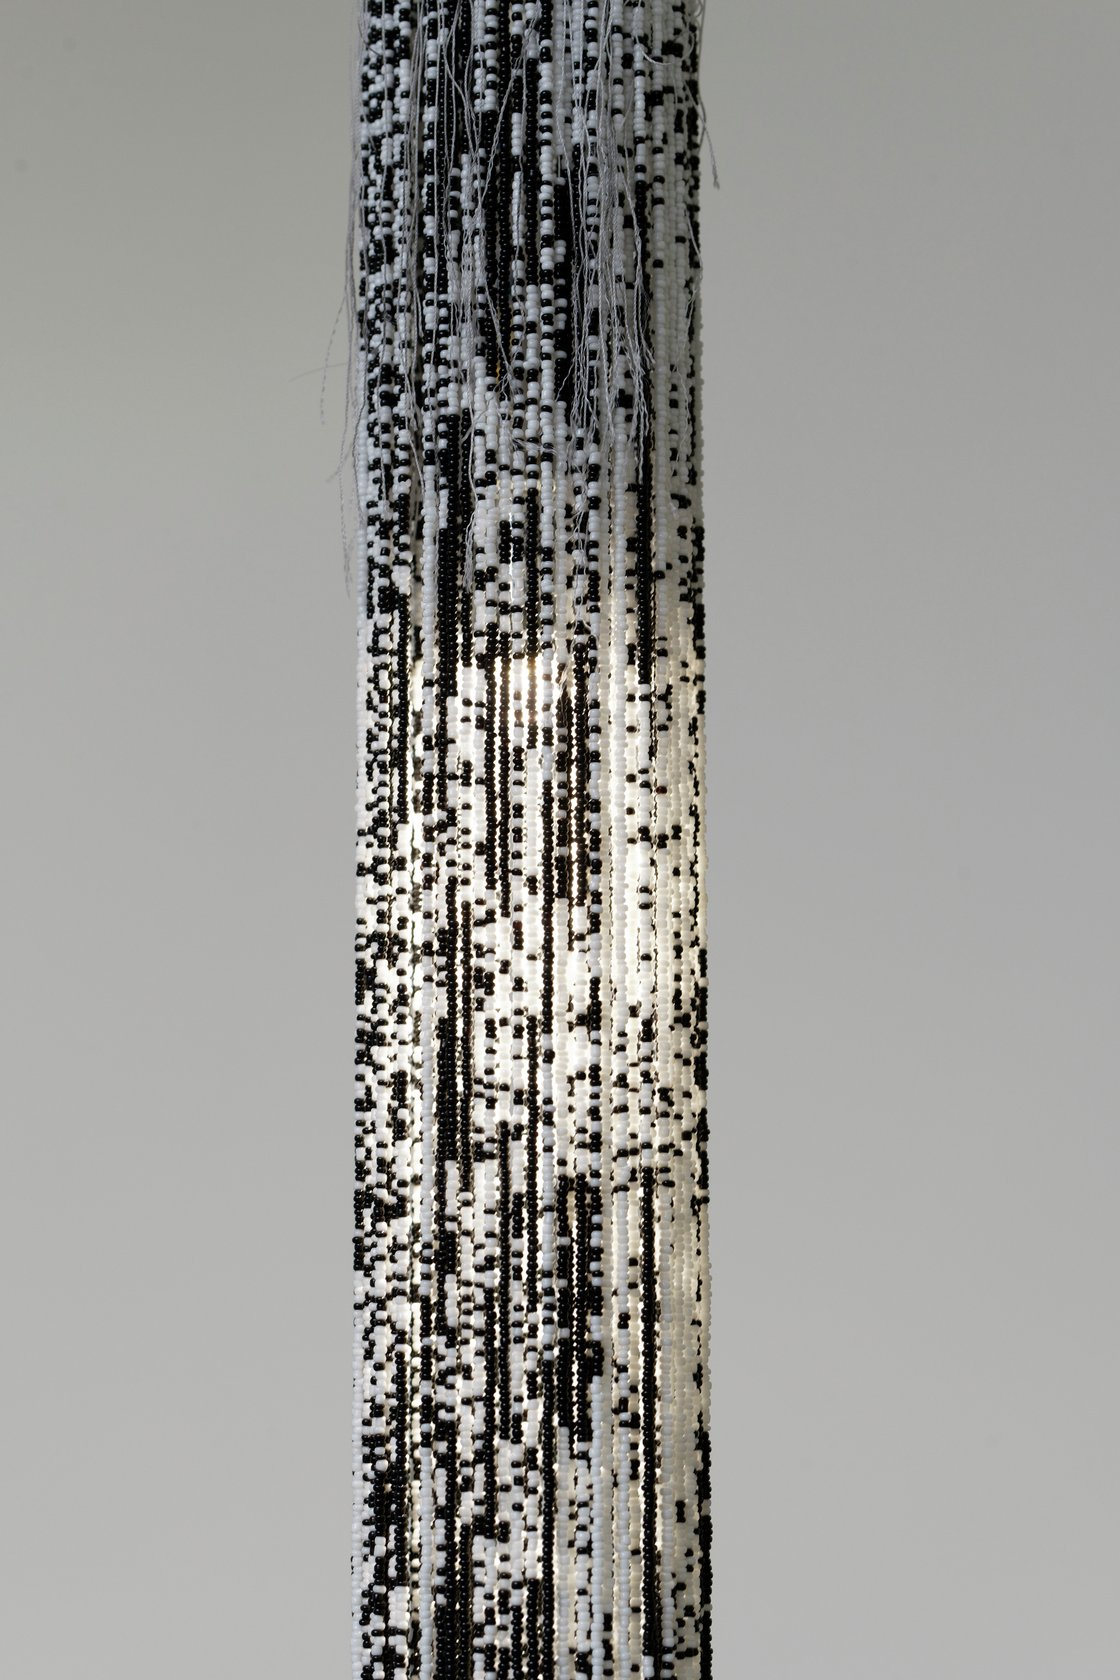 Mimosa Echard, Sap 3, 2021